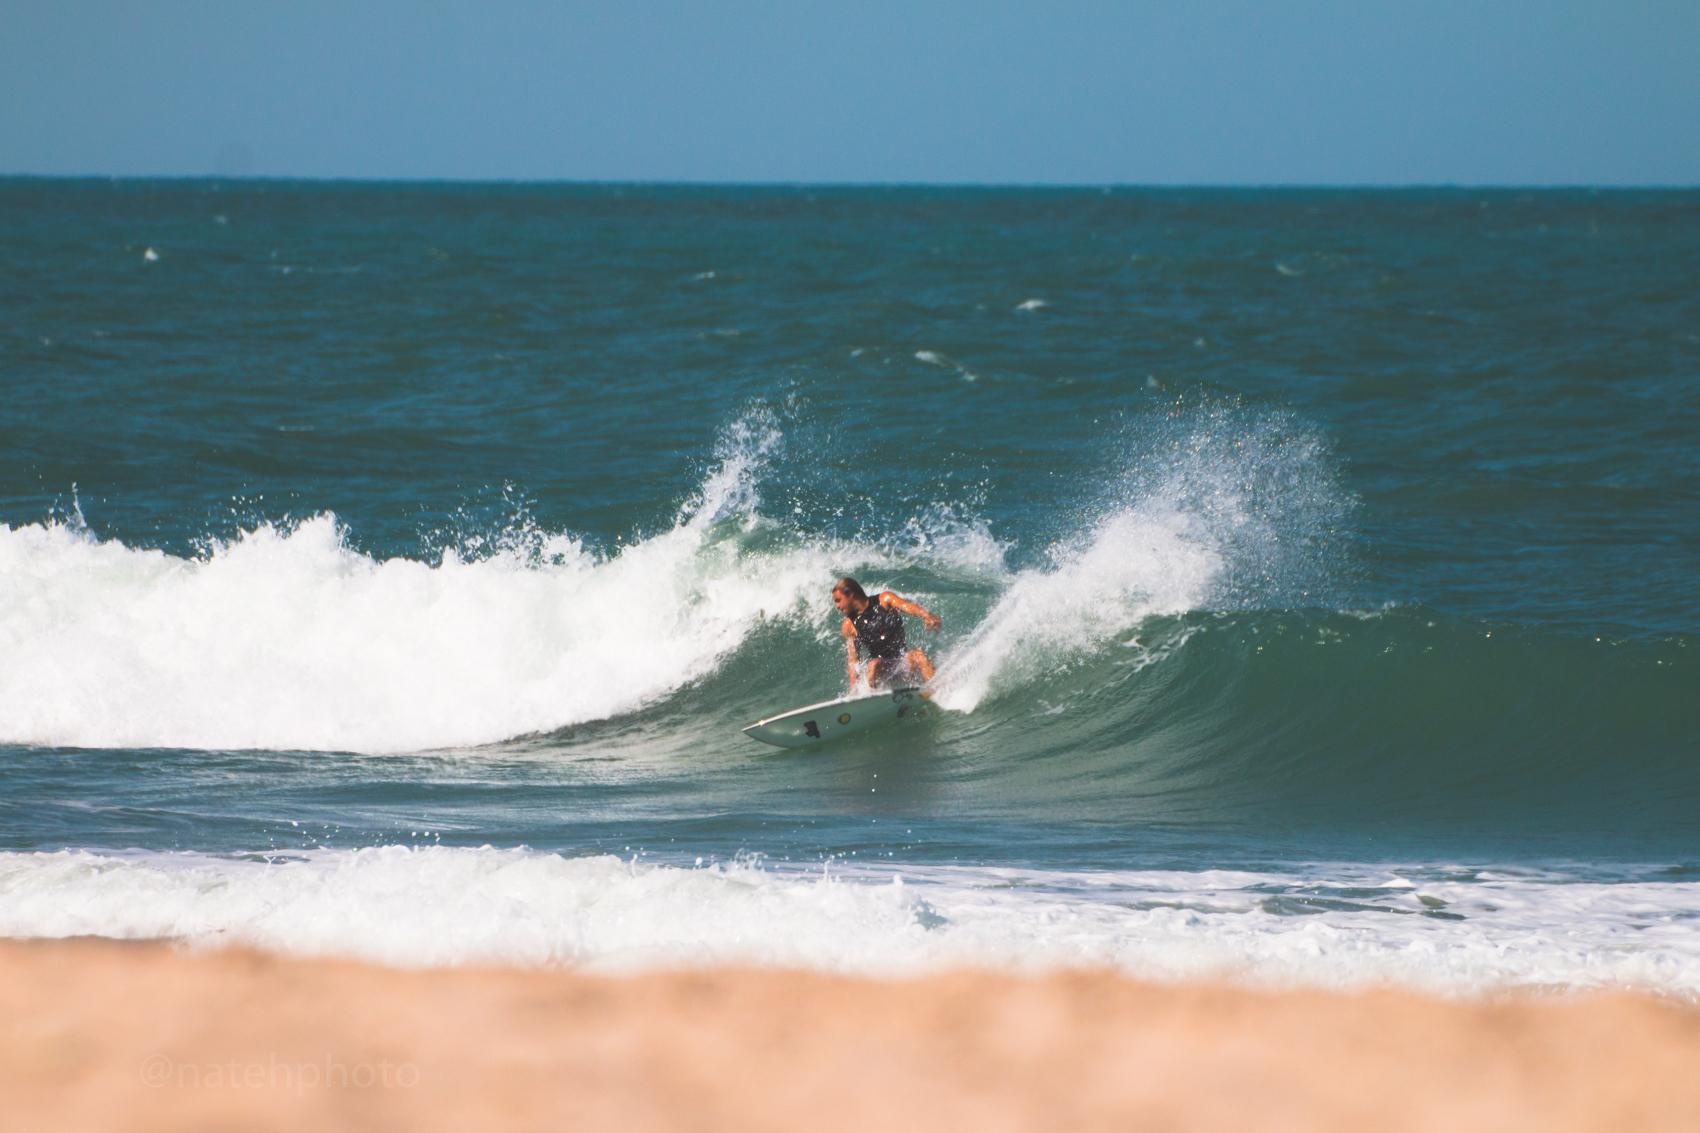 Brock Taylor surfing Sebastian Inlet, photo by Nathaniel Harrington